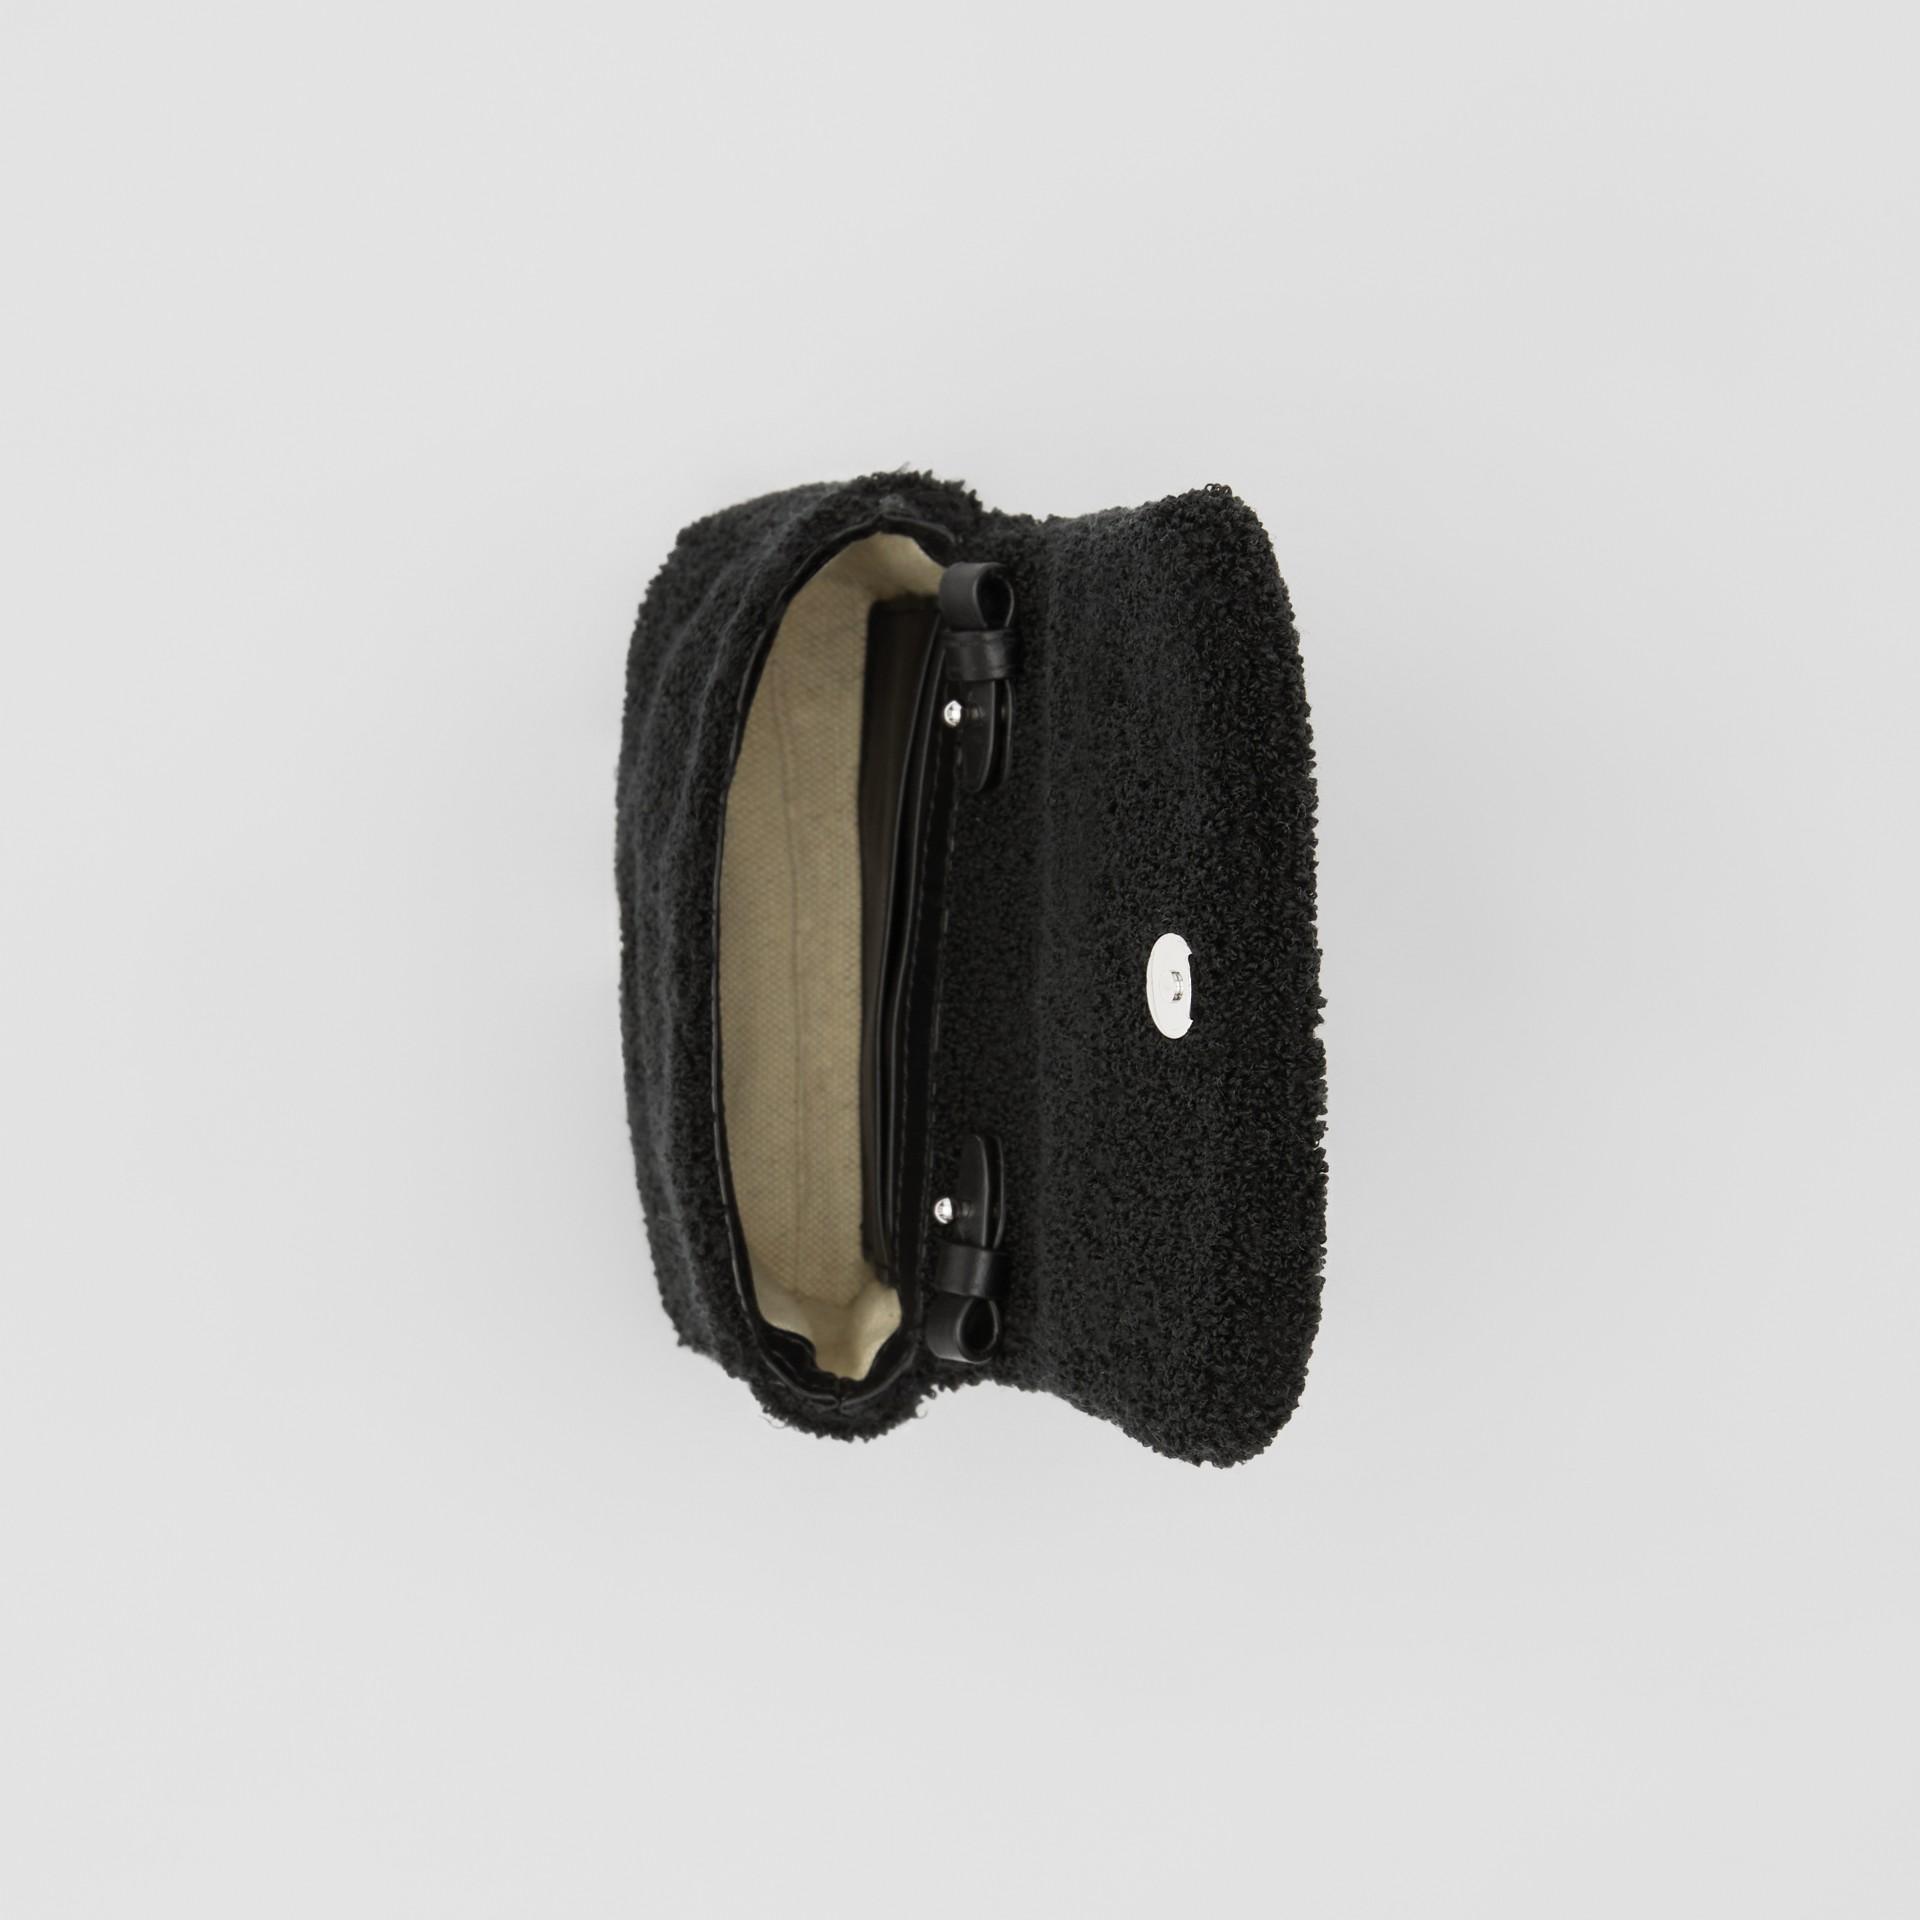 Micro Love Motif Towelling Lola Bag in Black - Women | Burberry - gallery image 4